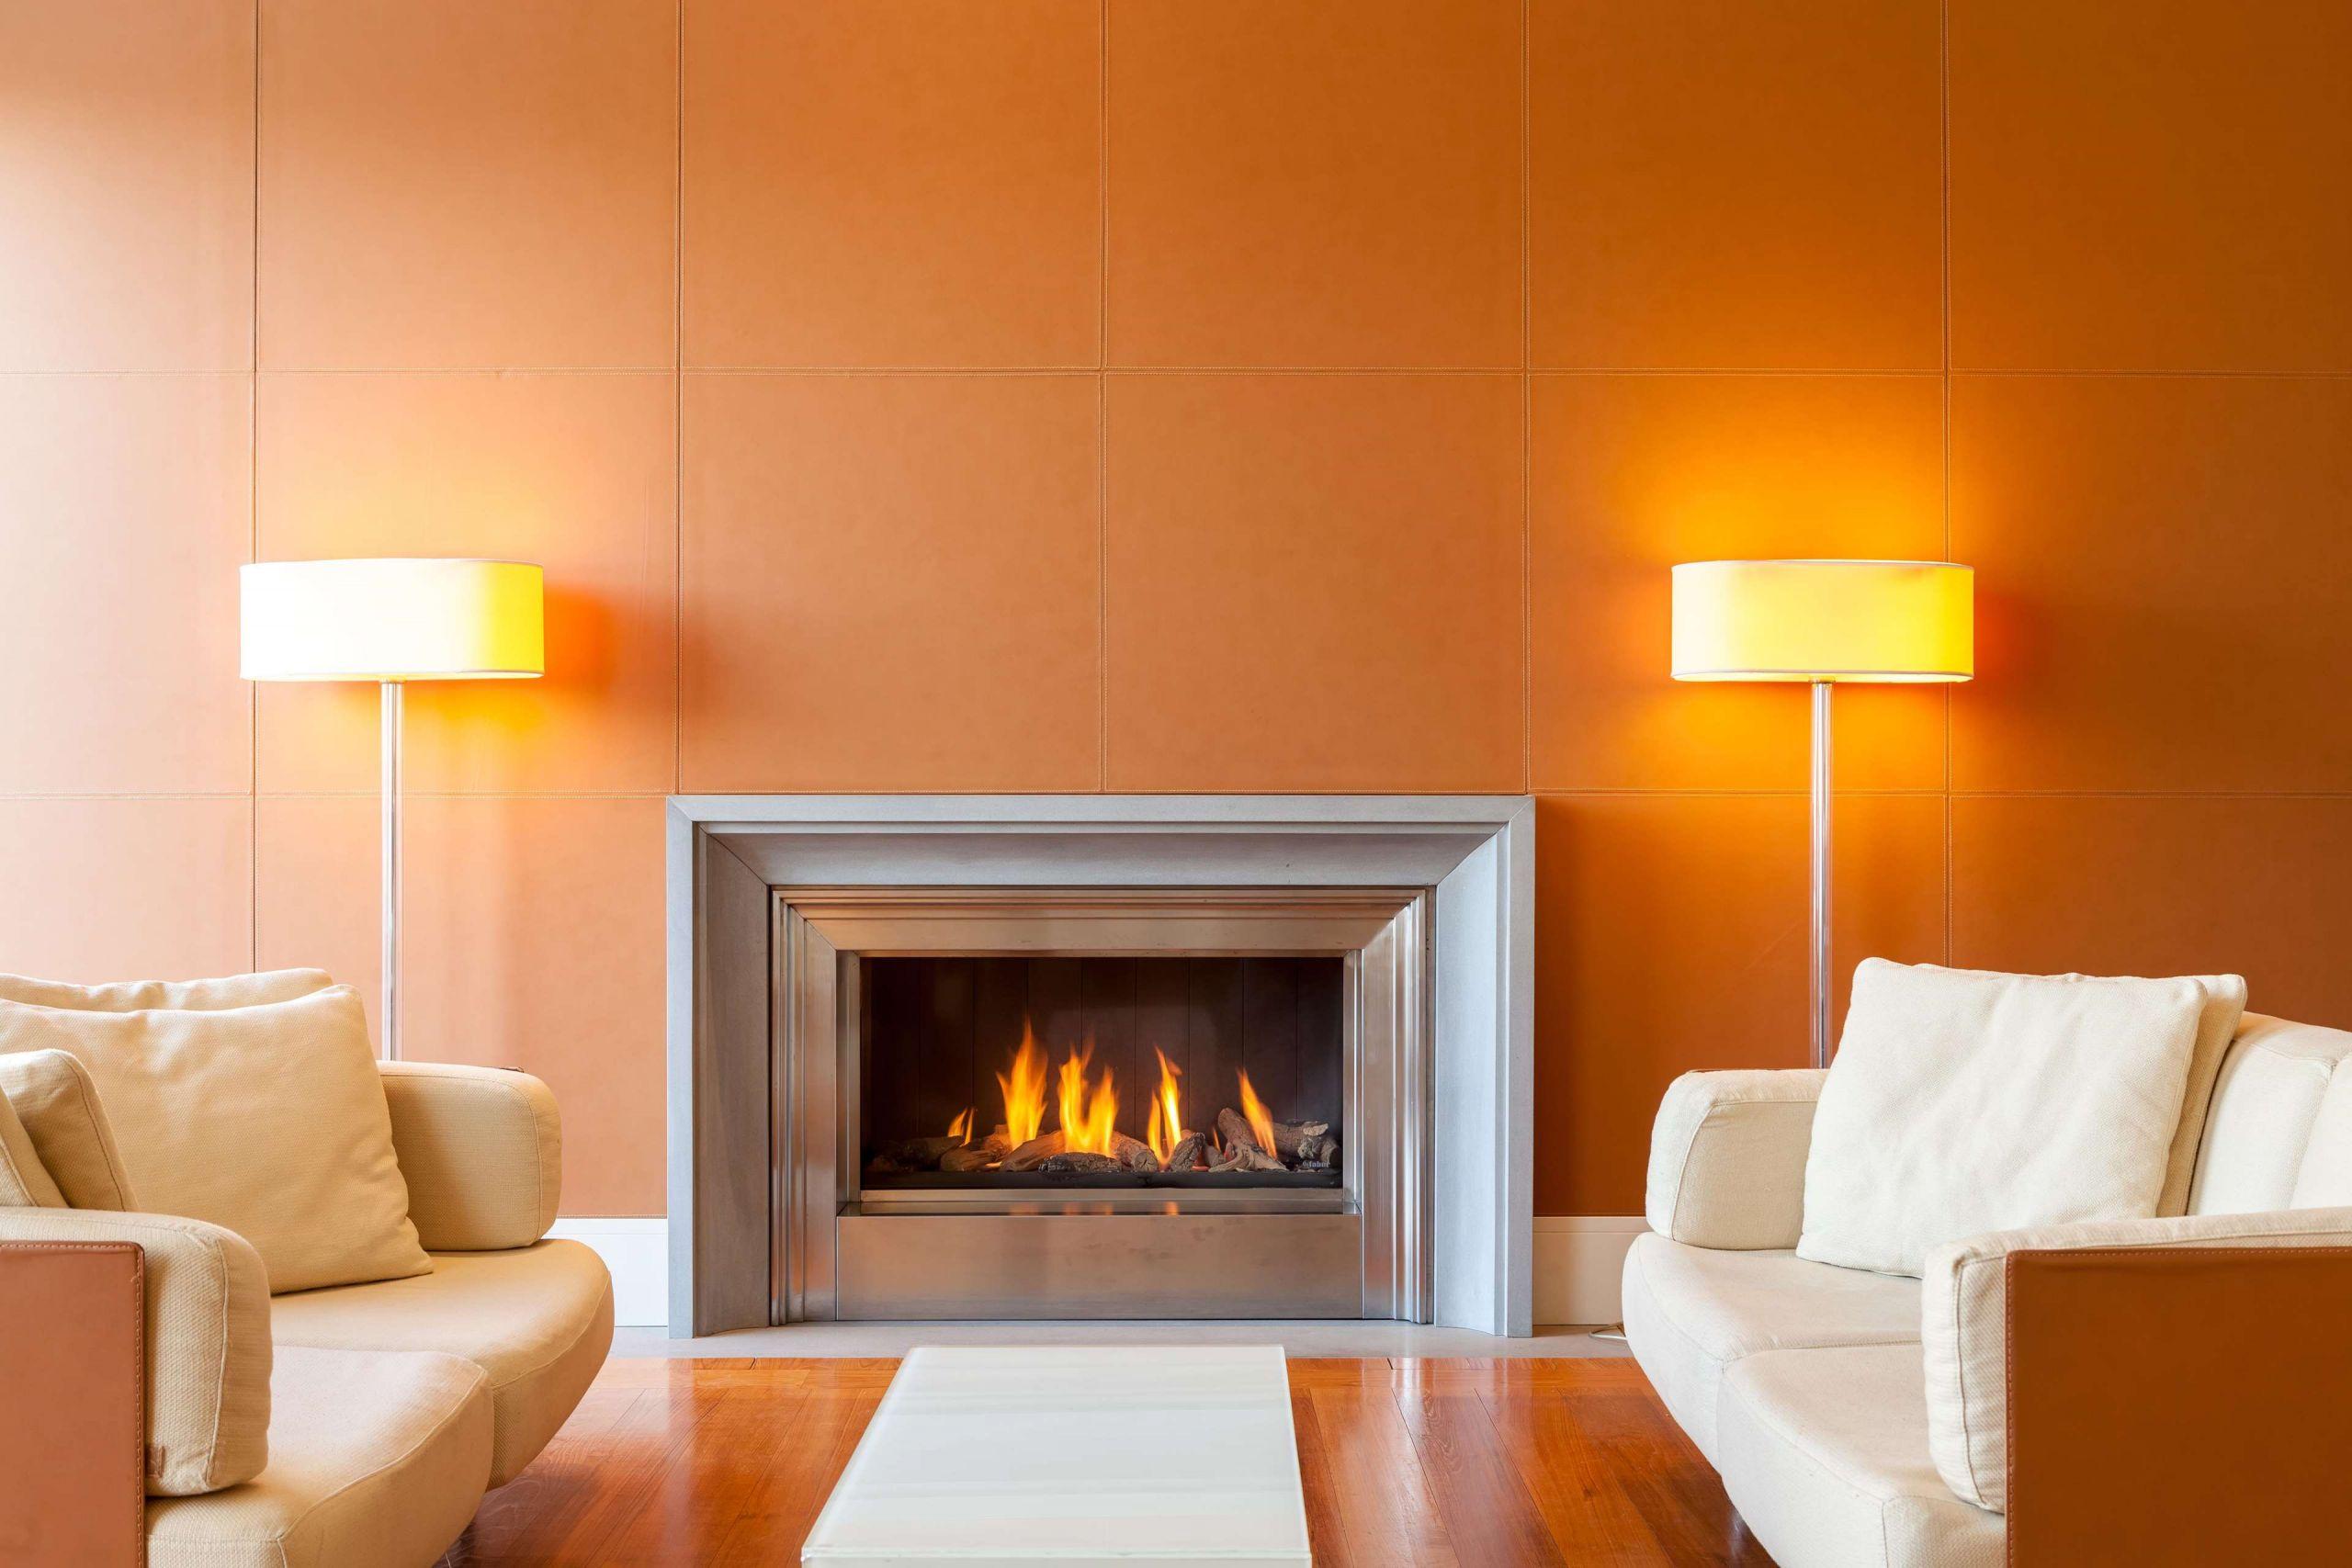 Fireplace Plus San Marcos New Hilton Garden Inn Florence Novoli Florence Price Address